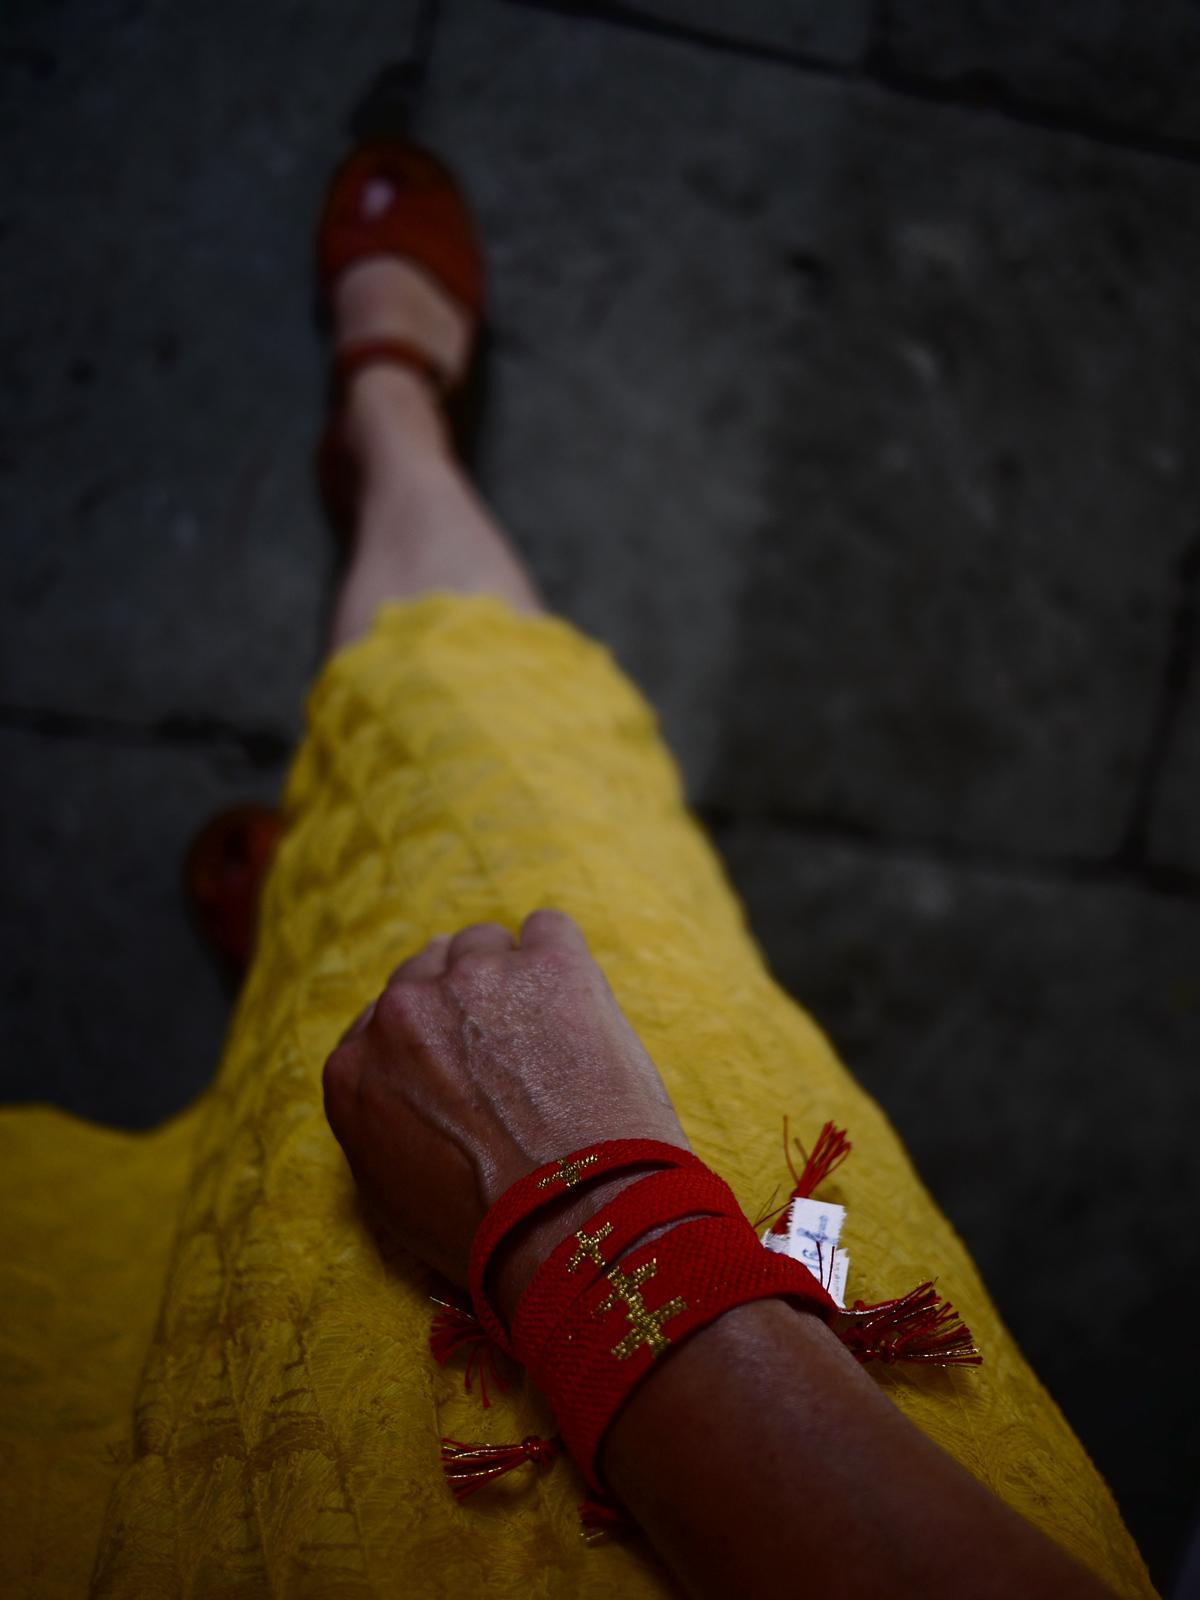 Bracelets LOOM - Design textile by Myriam Balaÿ myriam-balay-red1 ROUGE L'appartement